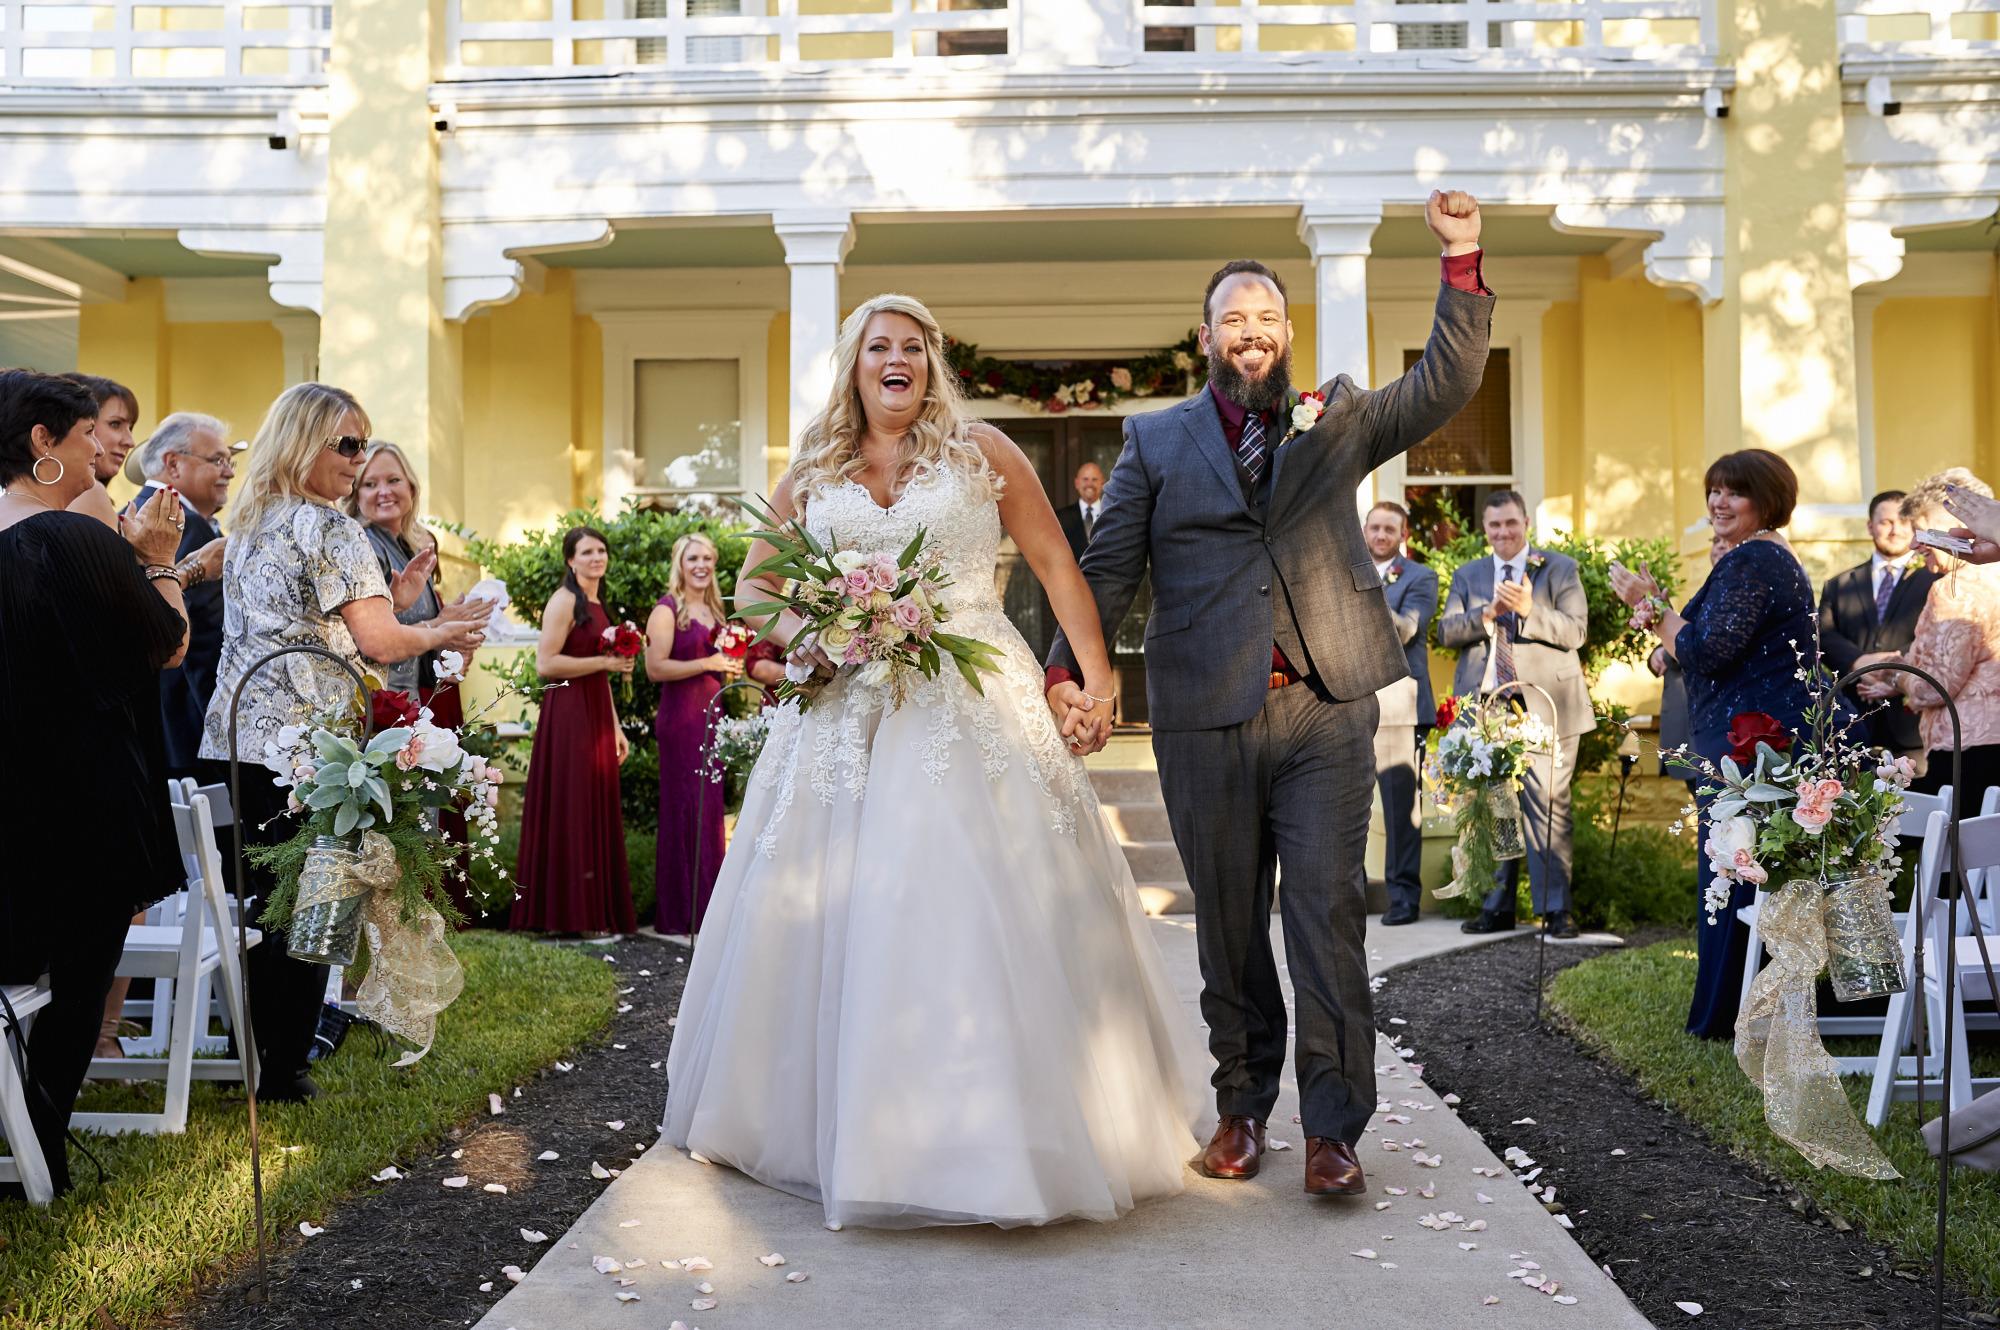 Taylor and Cody - Taylor Mansion and Crystal Ball Room - Taylor Texas - Wedding - 023